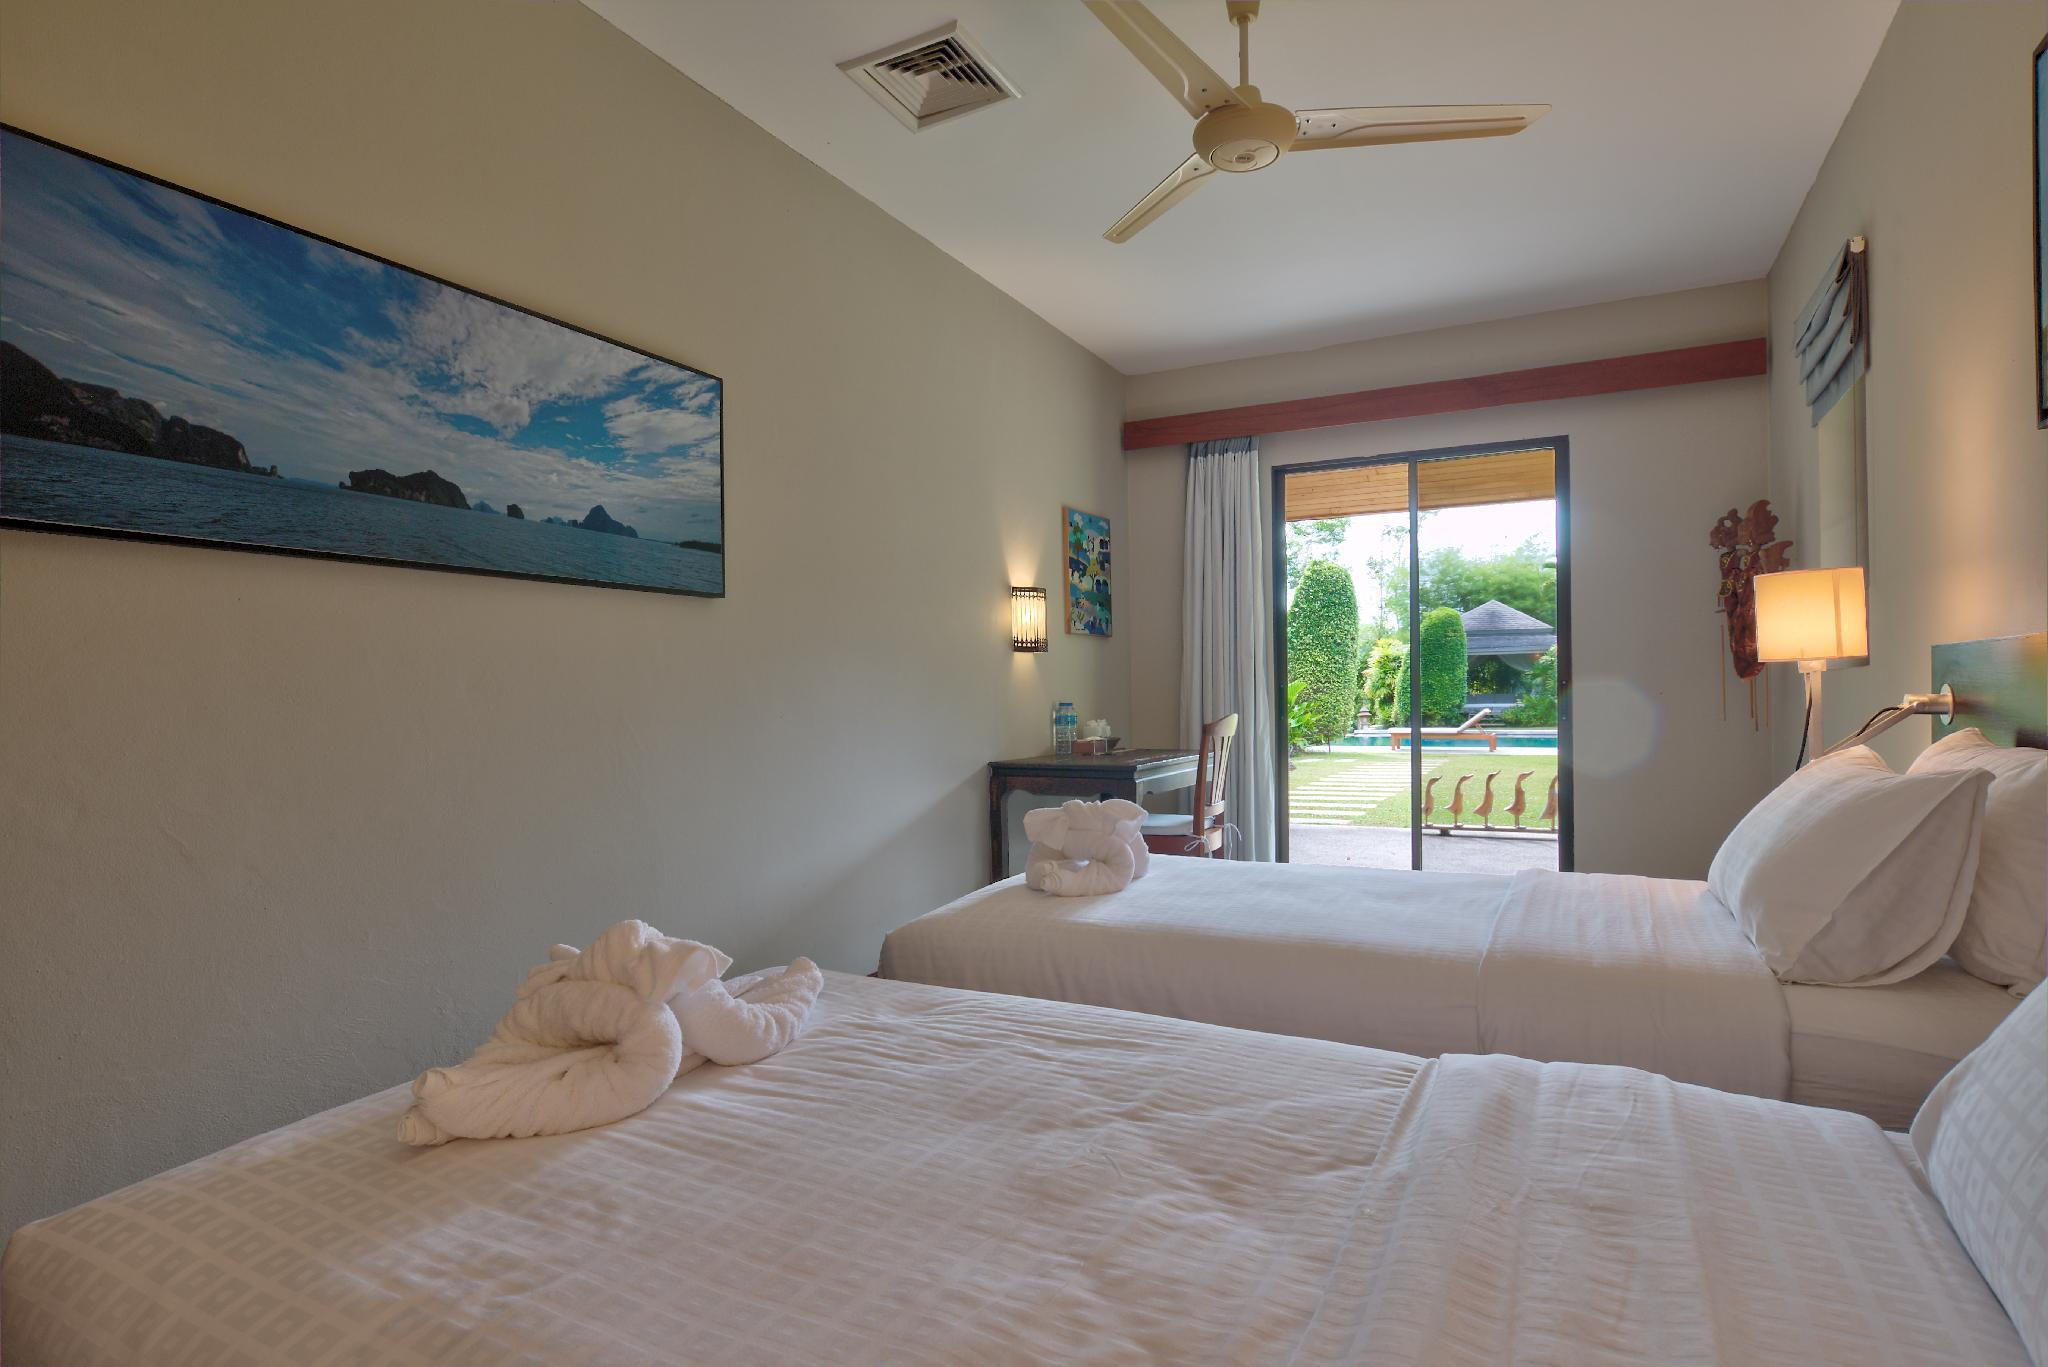 Luxury Retreat 5 Bedroom Pool Villa วิลลา 5 ห้องนอน 4 ห้องน้ำส่วนตัว ขนาด 1000 ตร.ม. – ไม้ขาว